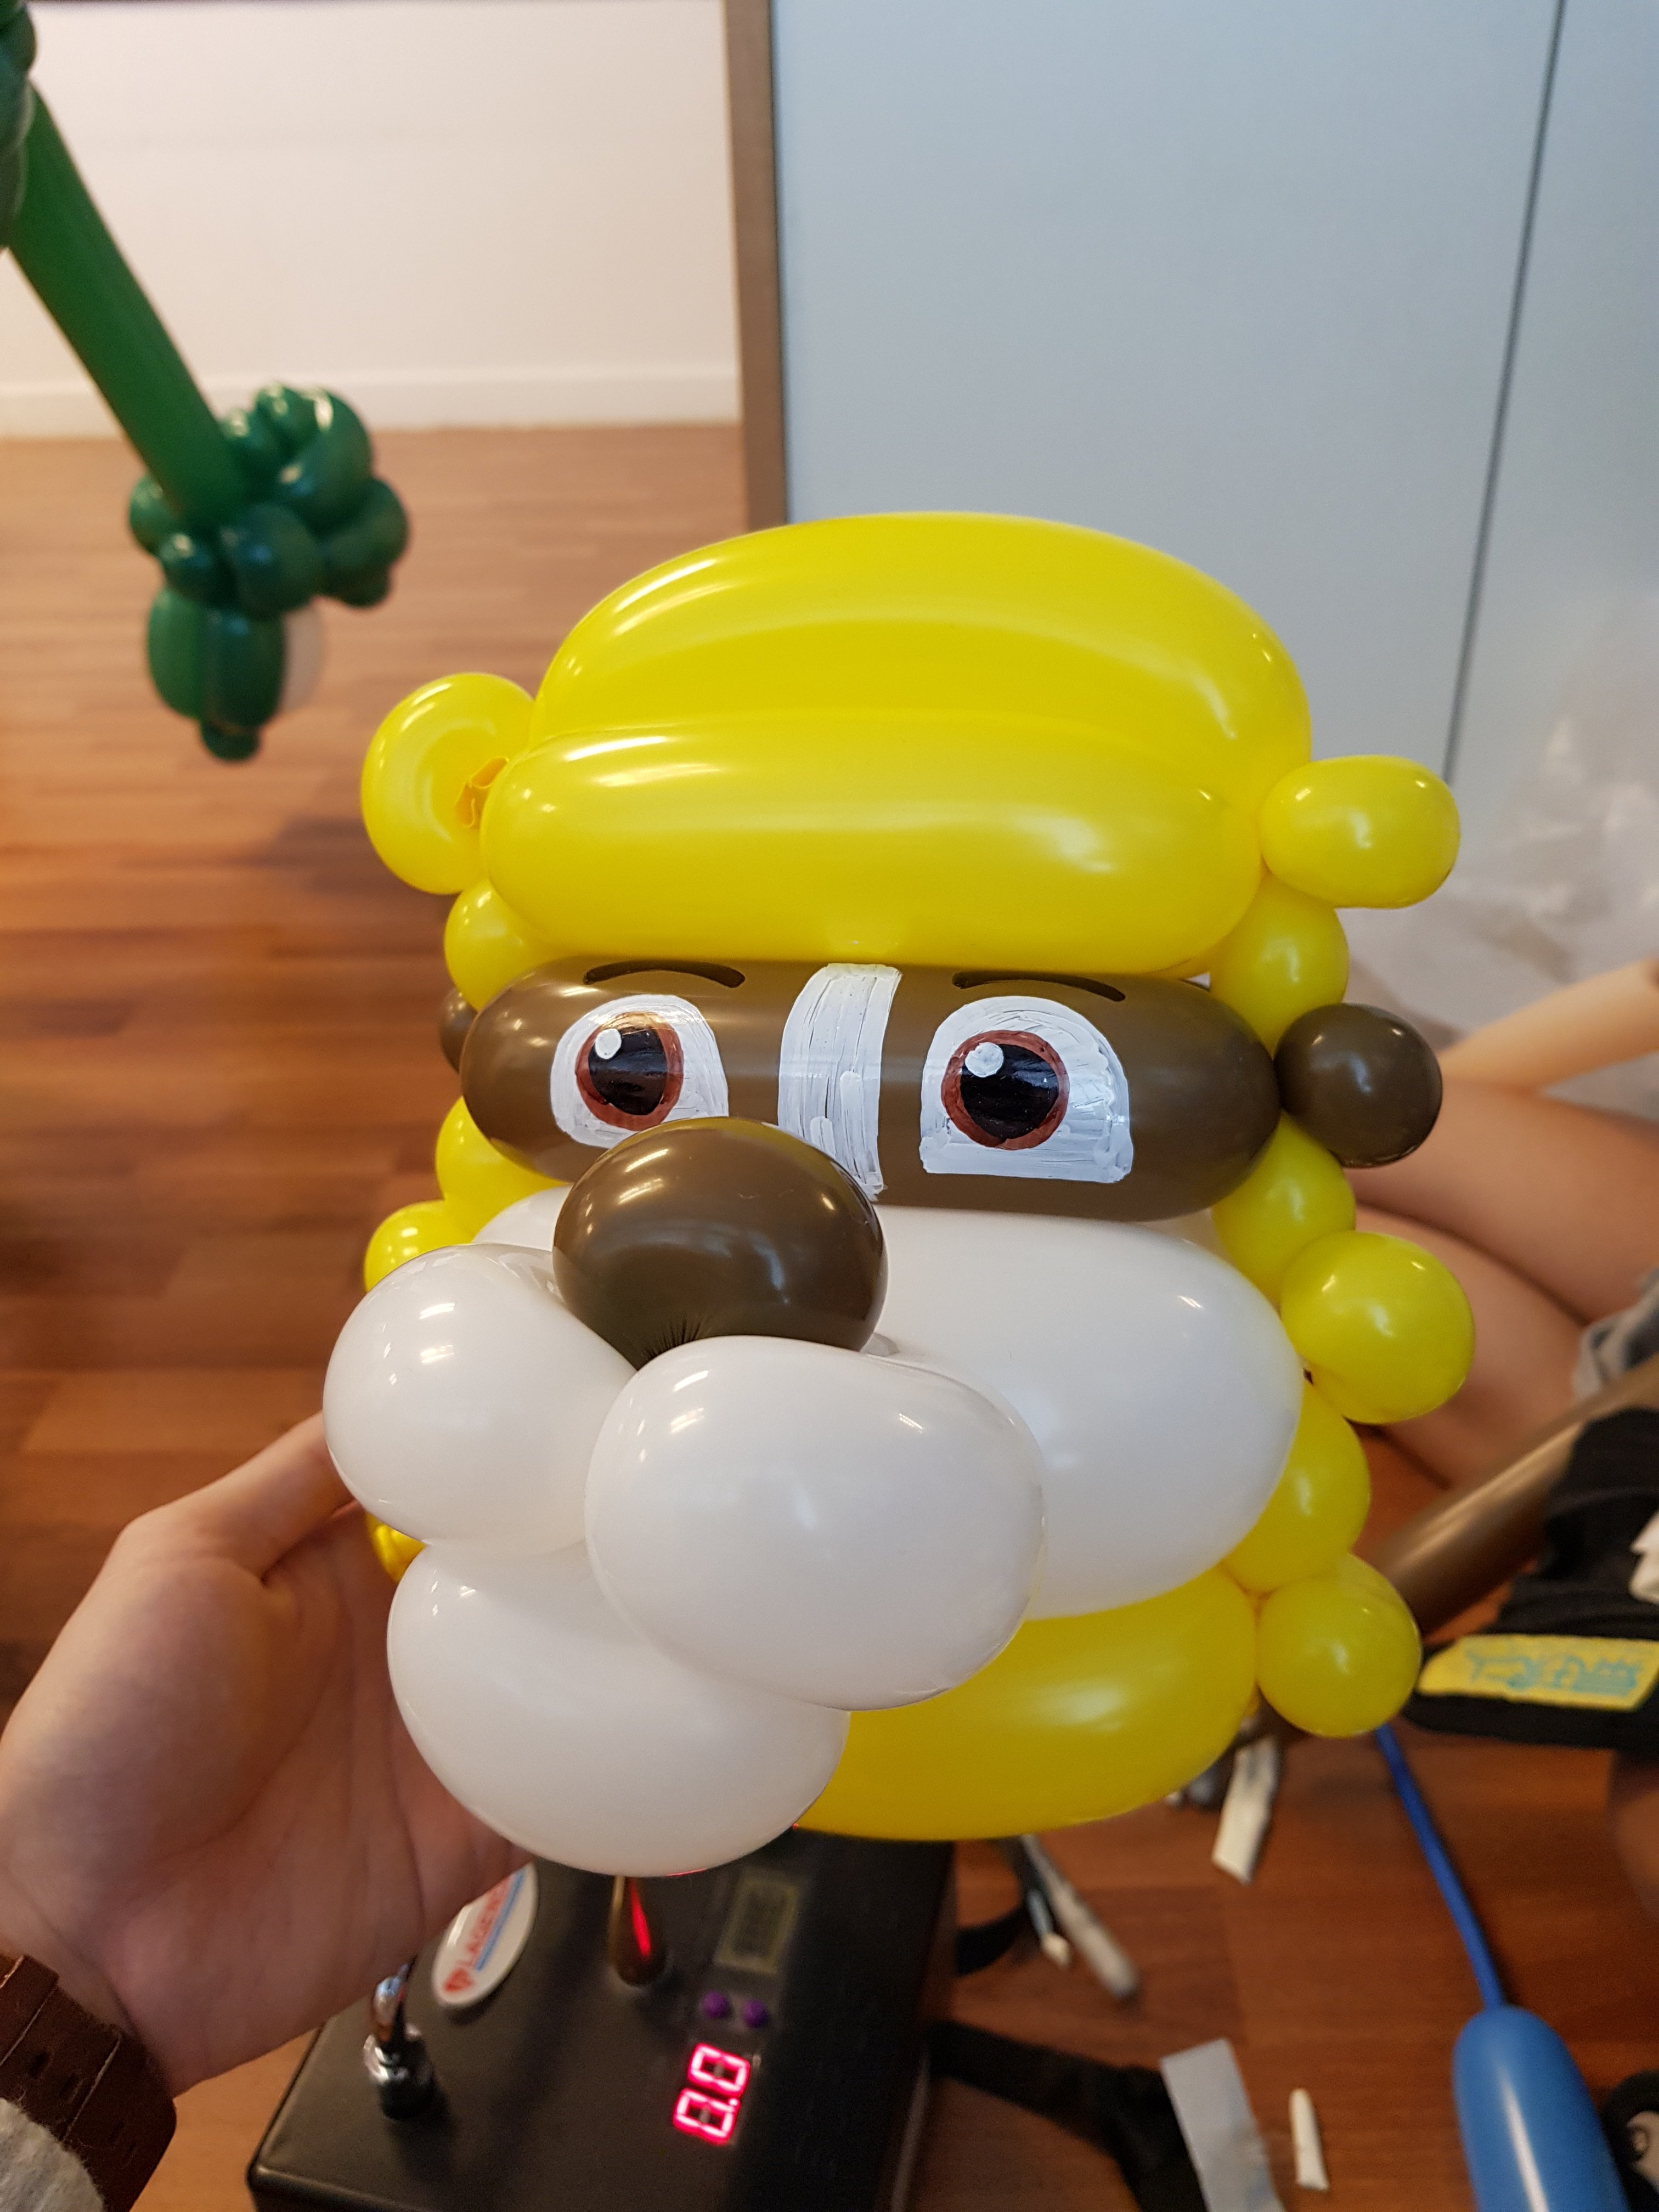 , Cartoon bracelet balloon sculpting by Jocelyn Balloons!, Singapore Balloon Decoration Services - Balloon Workshop and Balloon Sculpting